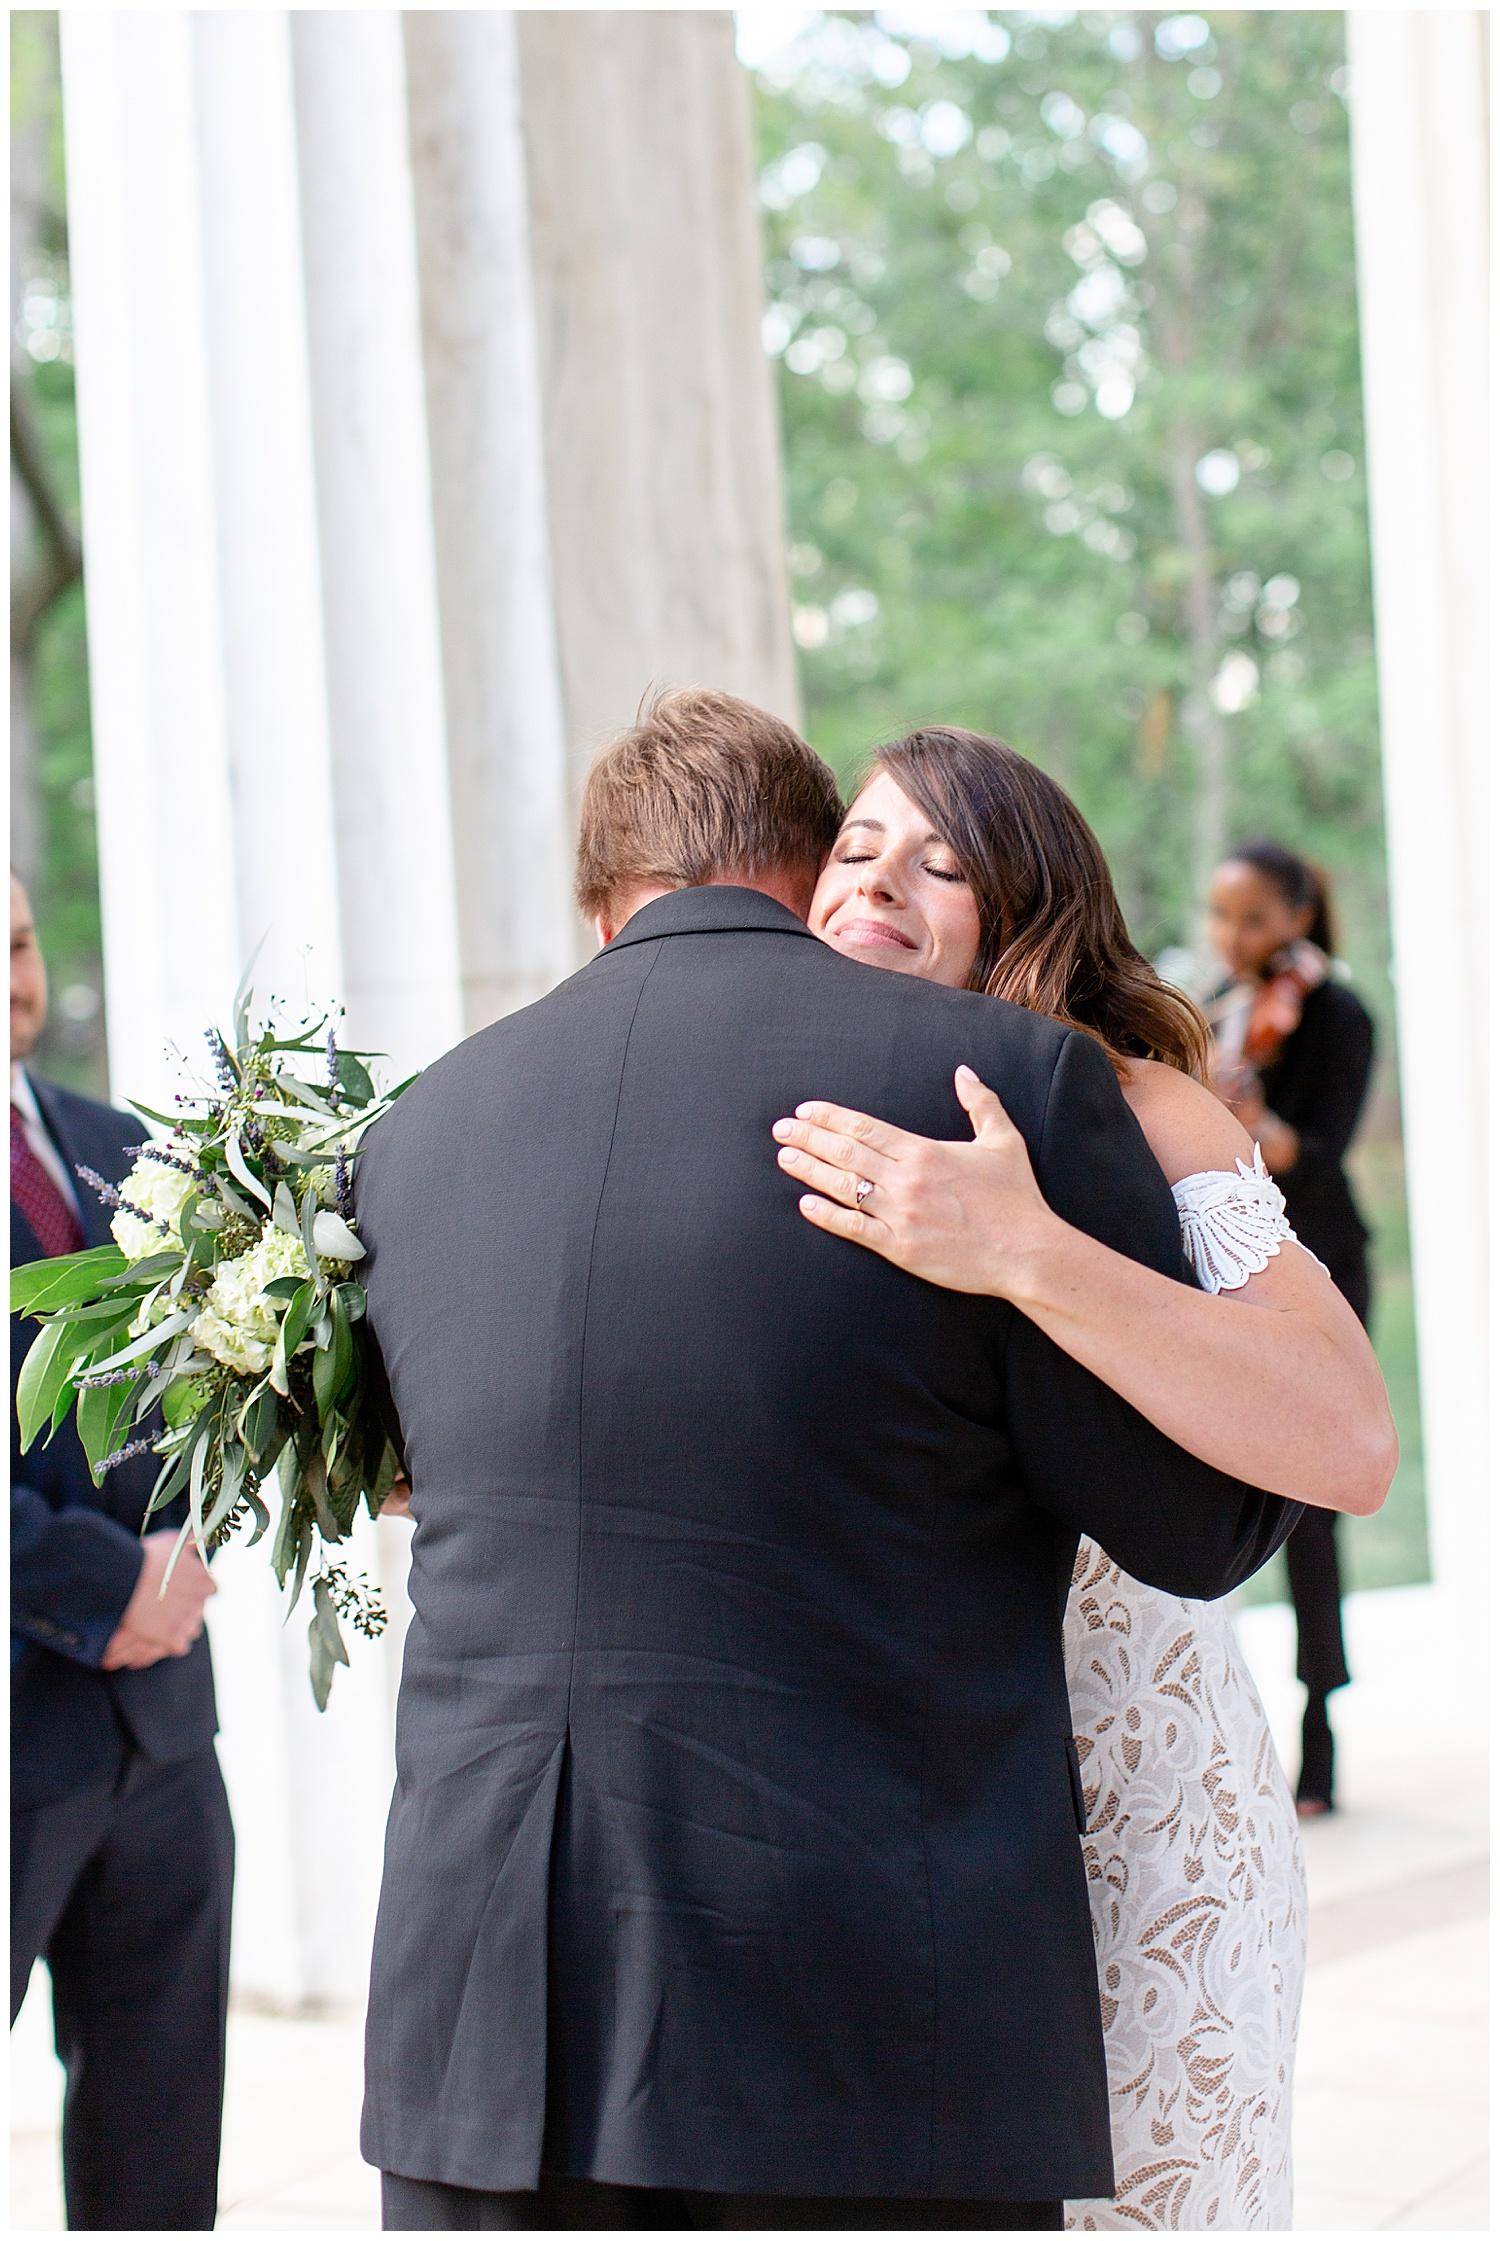 emily-belson-photography-washington-dc-wedding-10.jpg